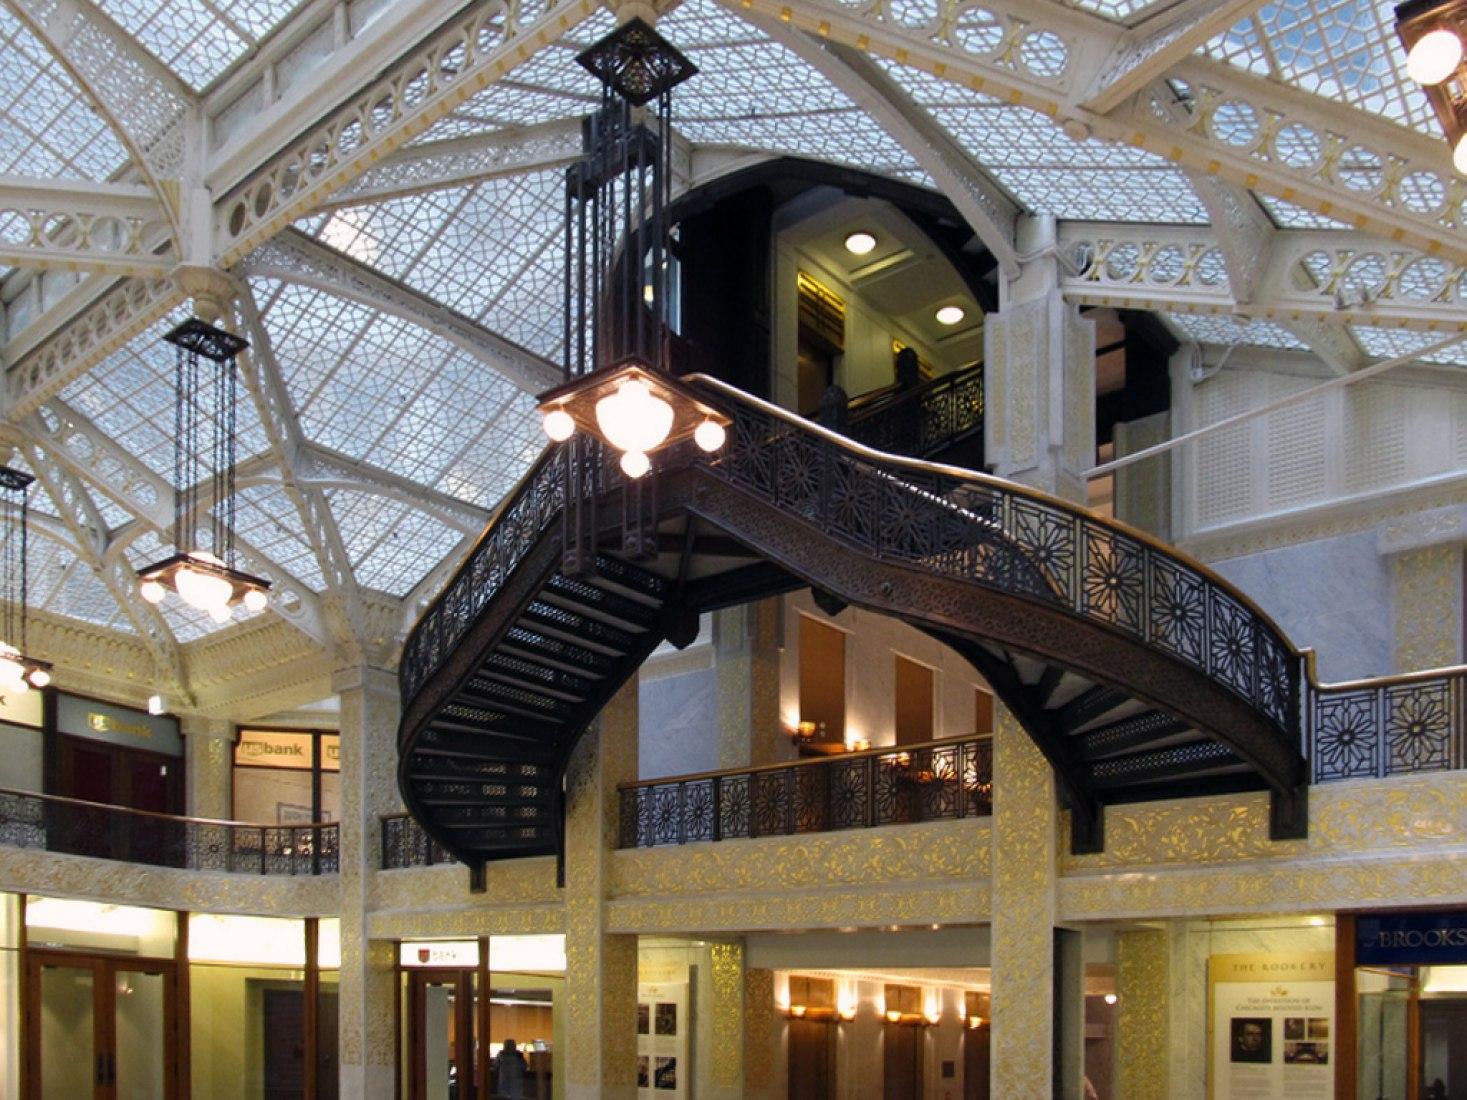 Vista inteiror. Edificio Rookery por Frank Lloyd Wright, Chicago, Illinois, Estados Unidos, 1887-1888. Fotografía © Flickr, Ken Lund.